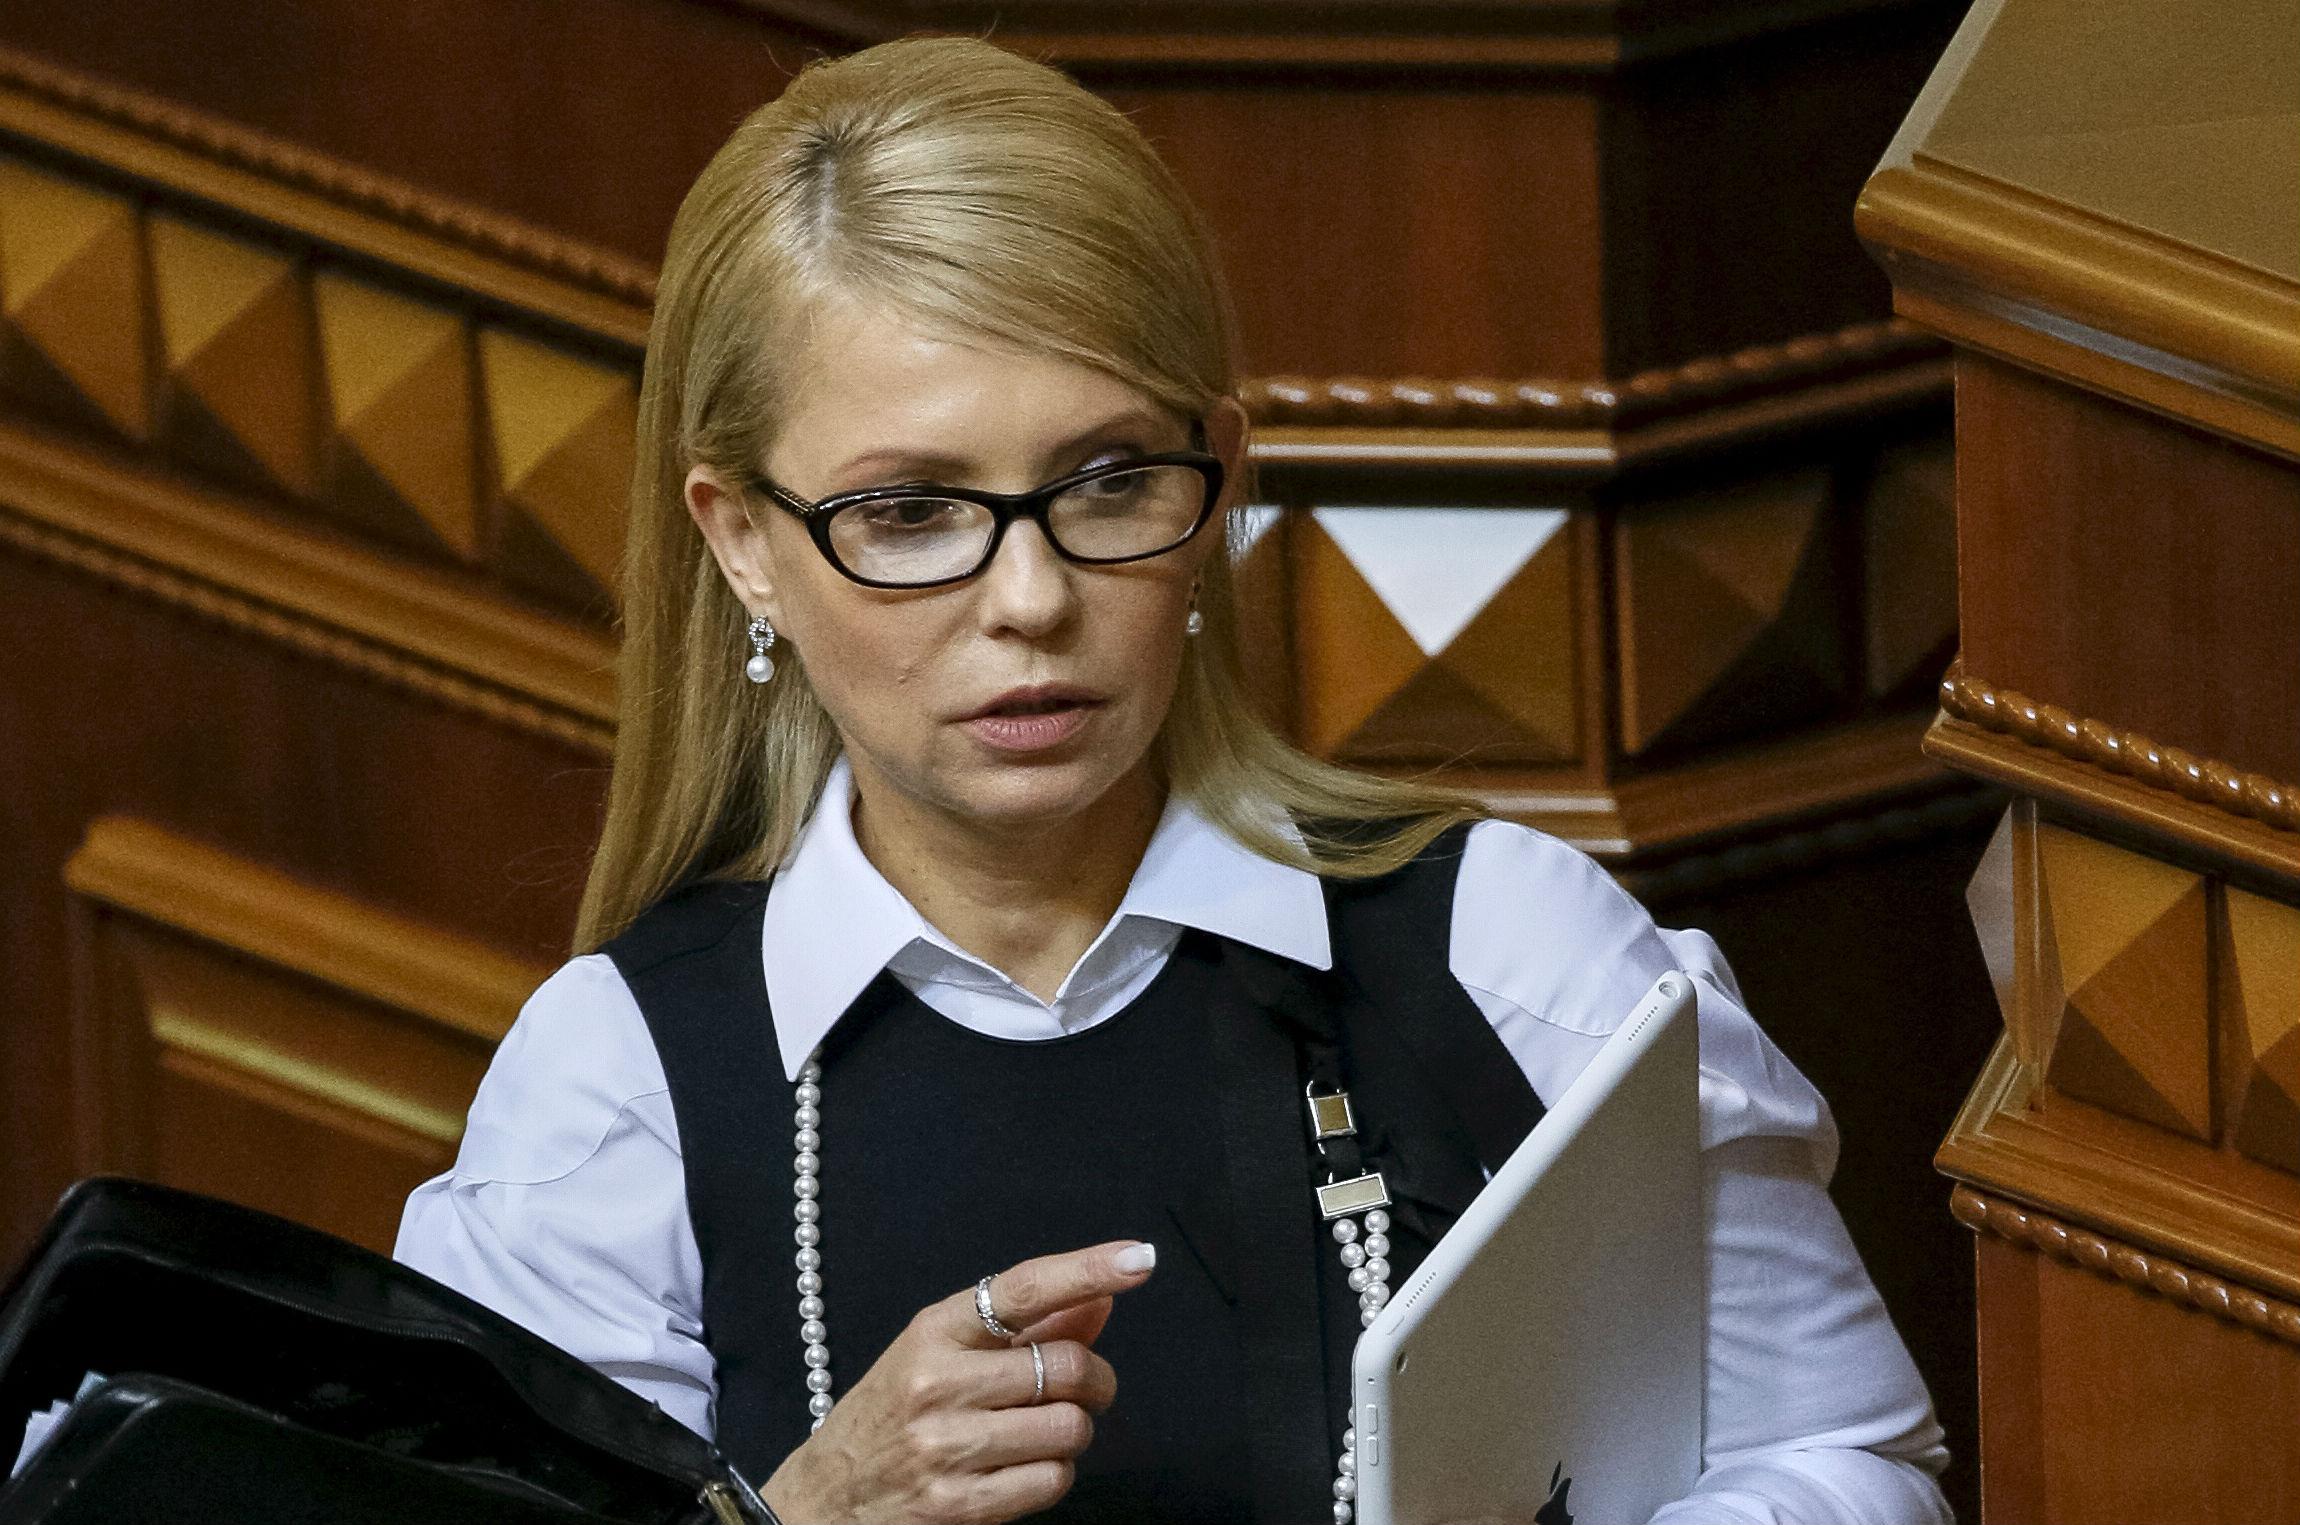 Tymoshenko and Kolomoyskyi Score Wins in Ukraine's Special Elections